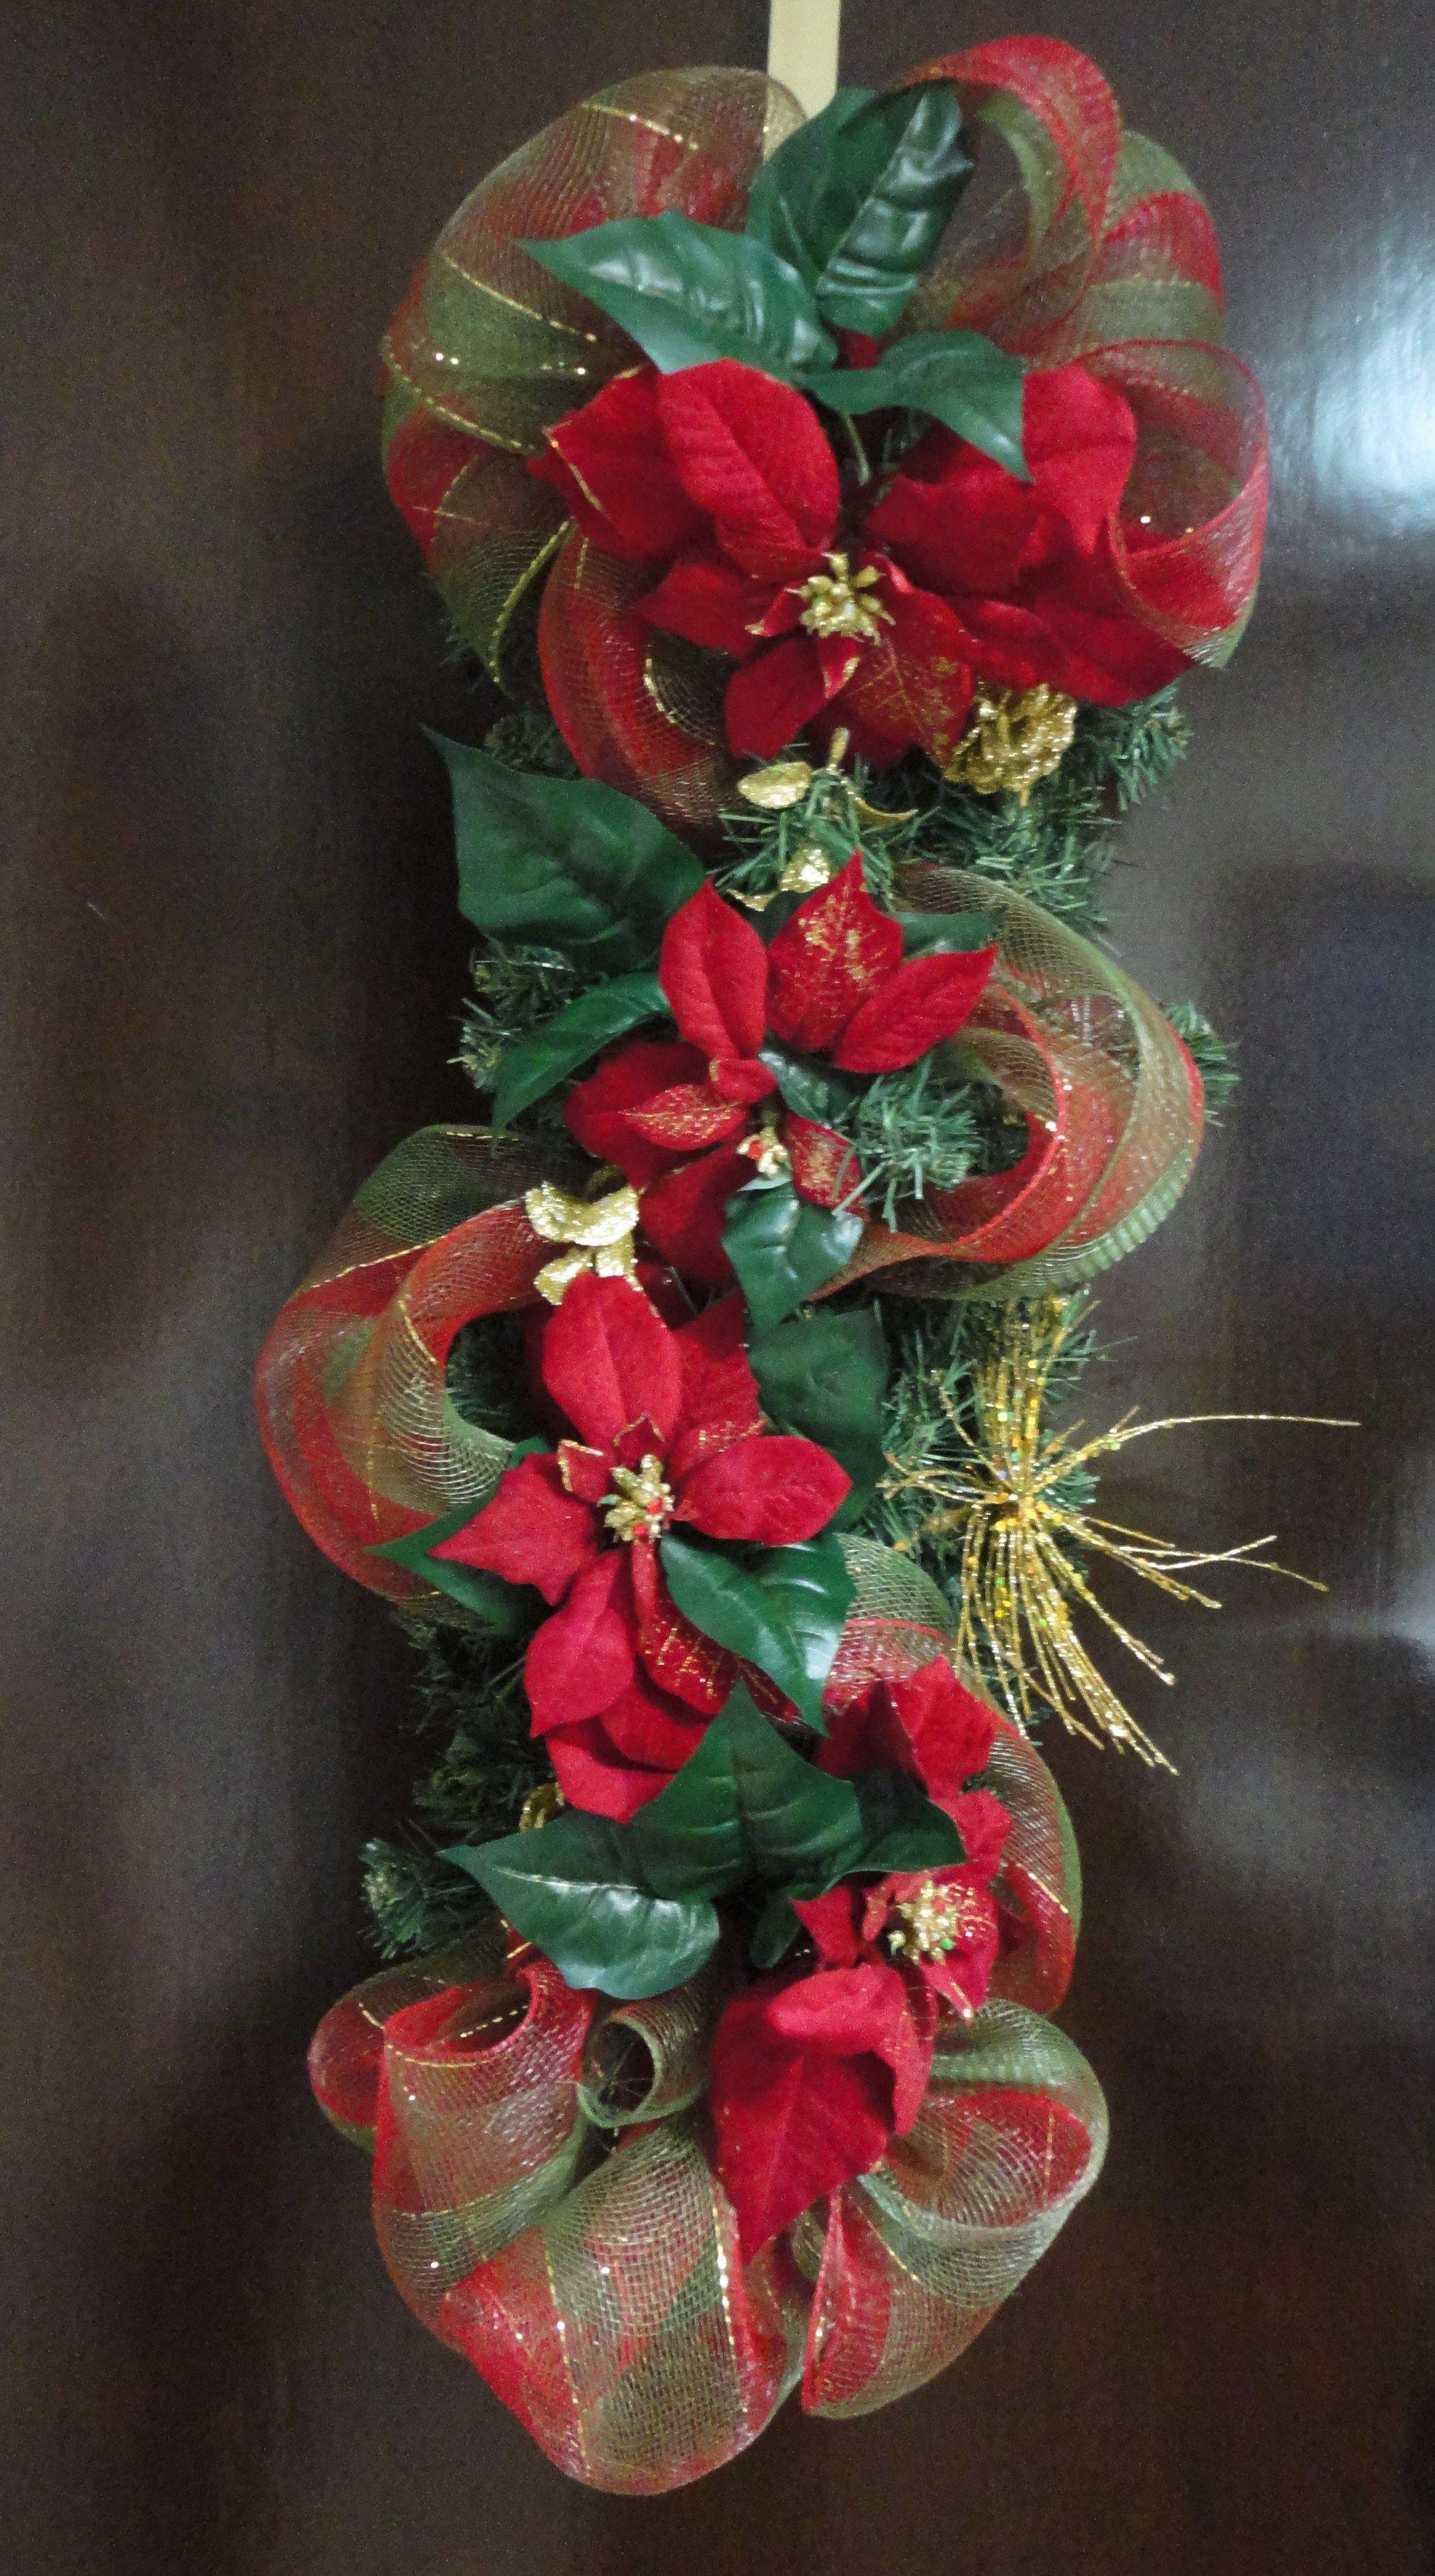 Pin de pattyarce en decoraci n navide a guilen s art - Guirnaldas de navidad ...